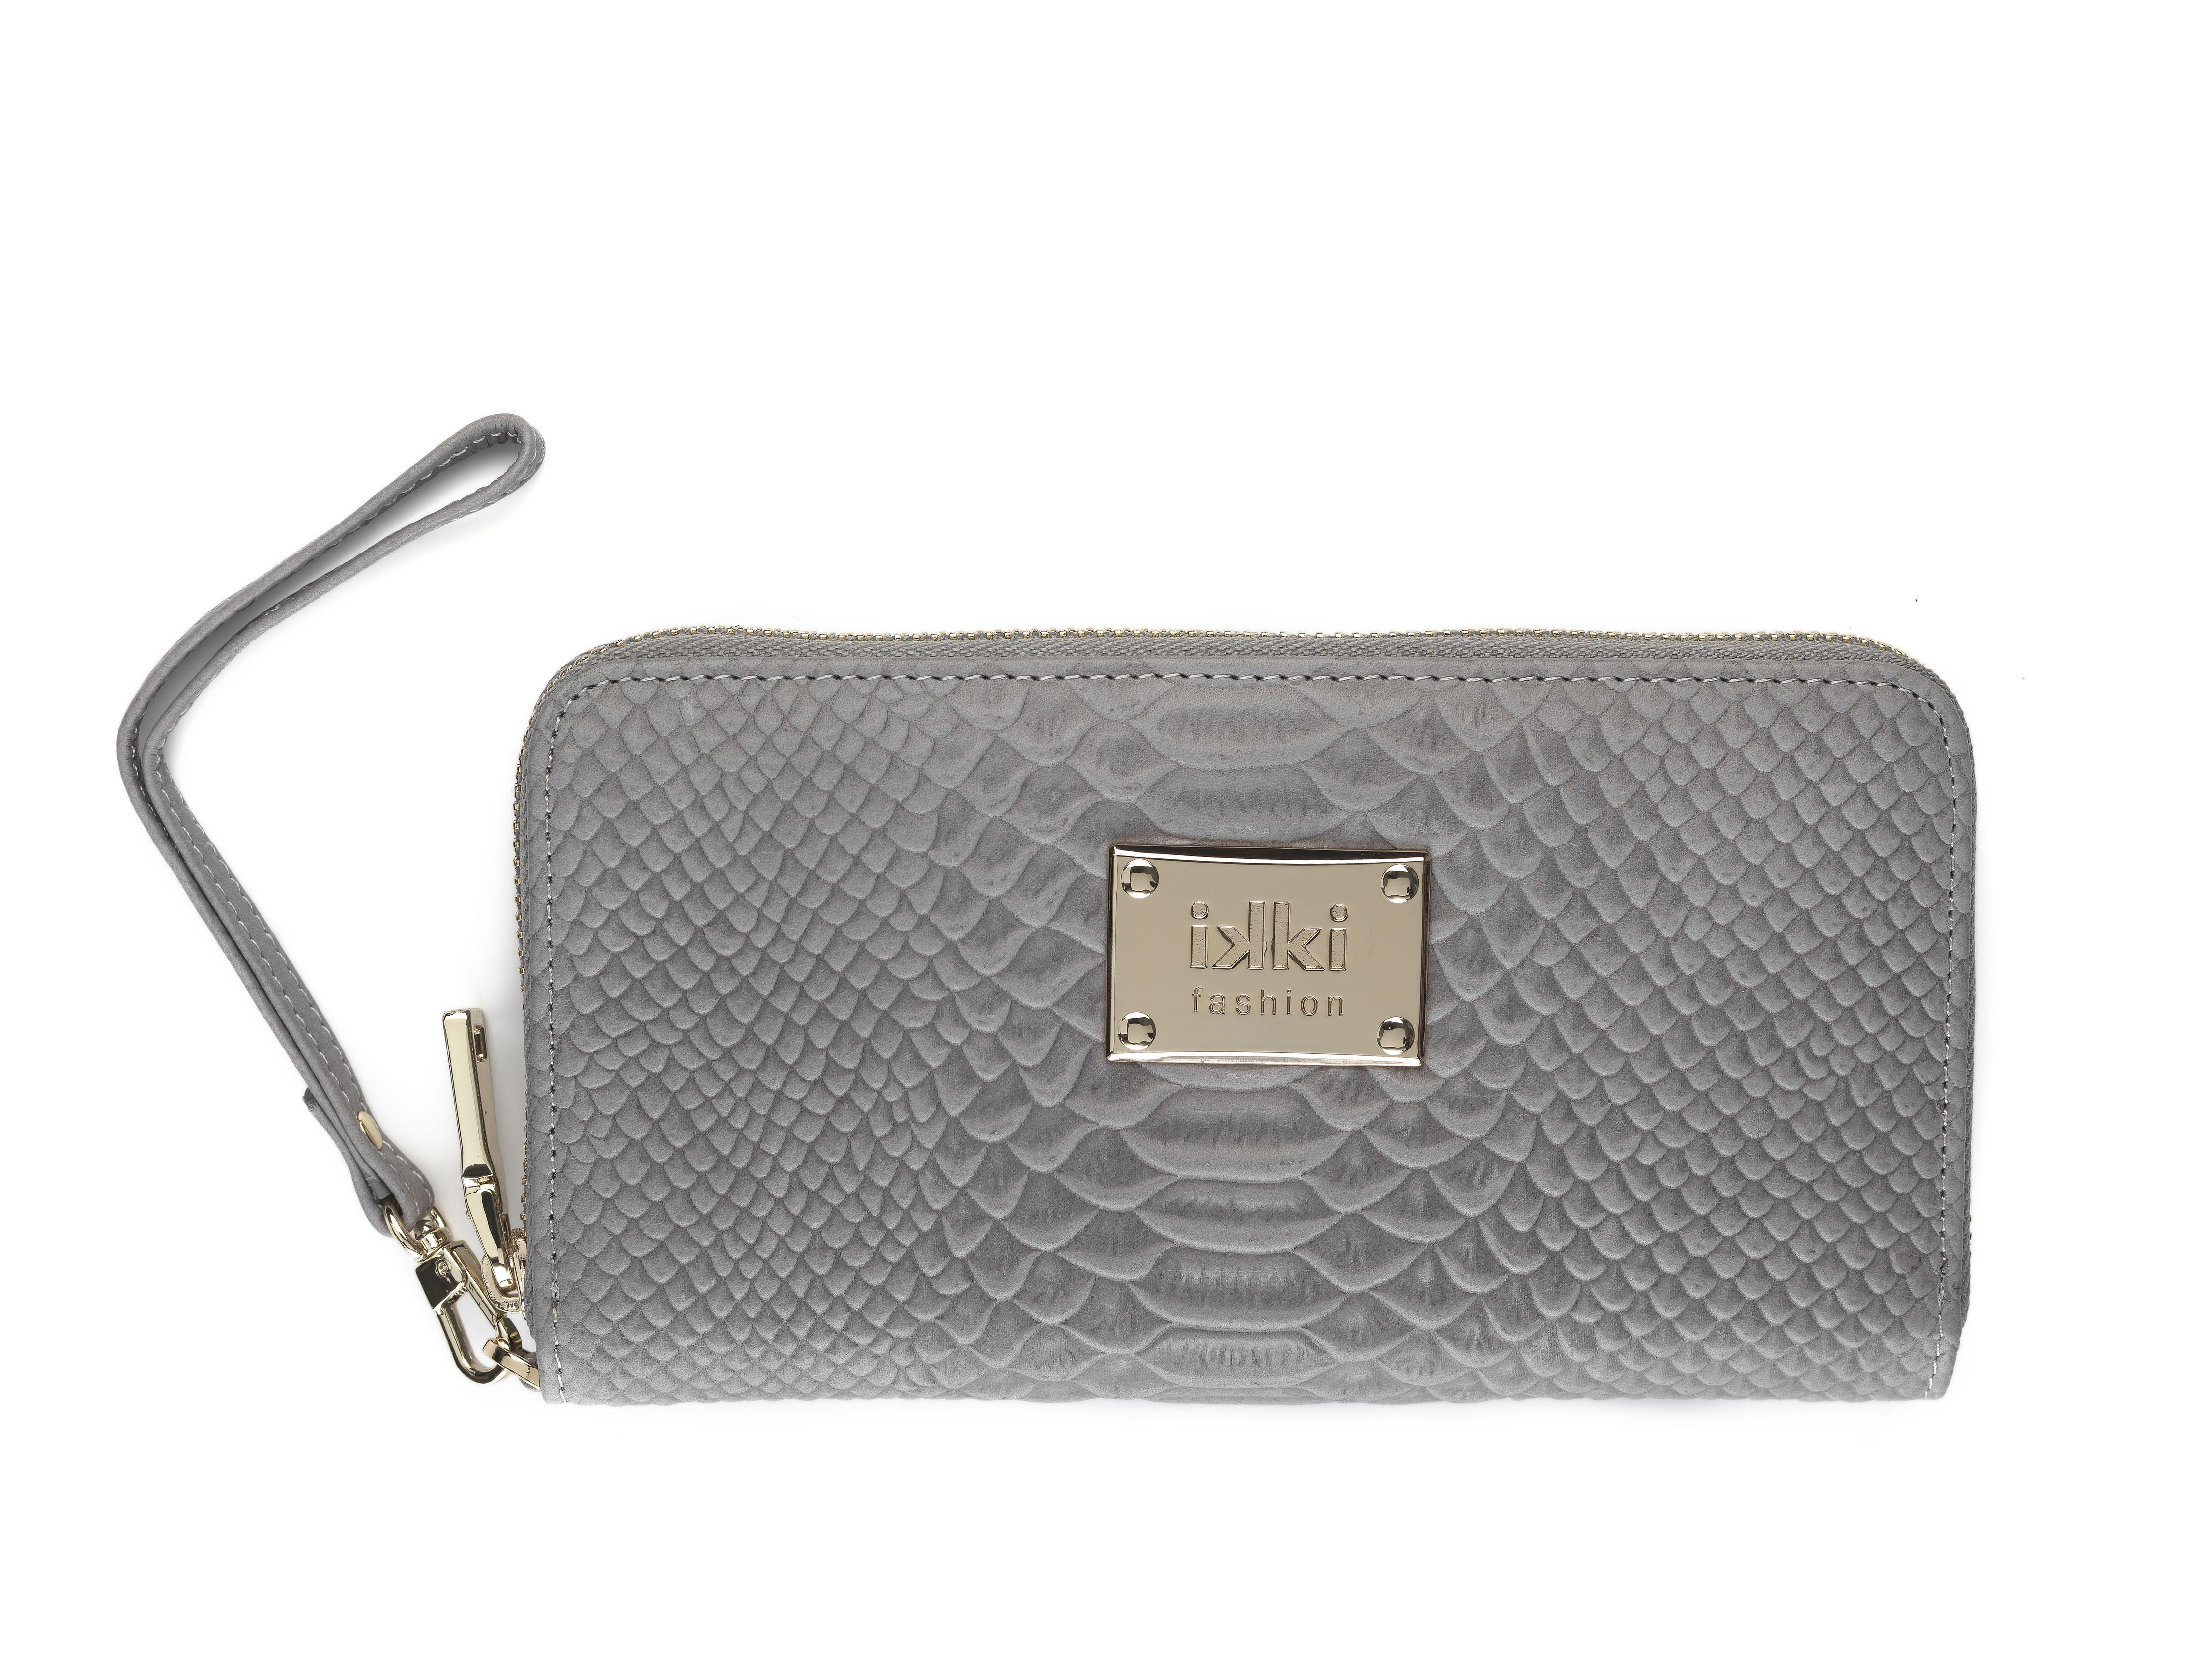 d5f9f7a4a7f Portemonnee, purse, wallet, leer, ikki Fashion | Hello September ...